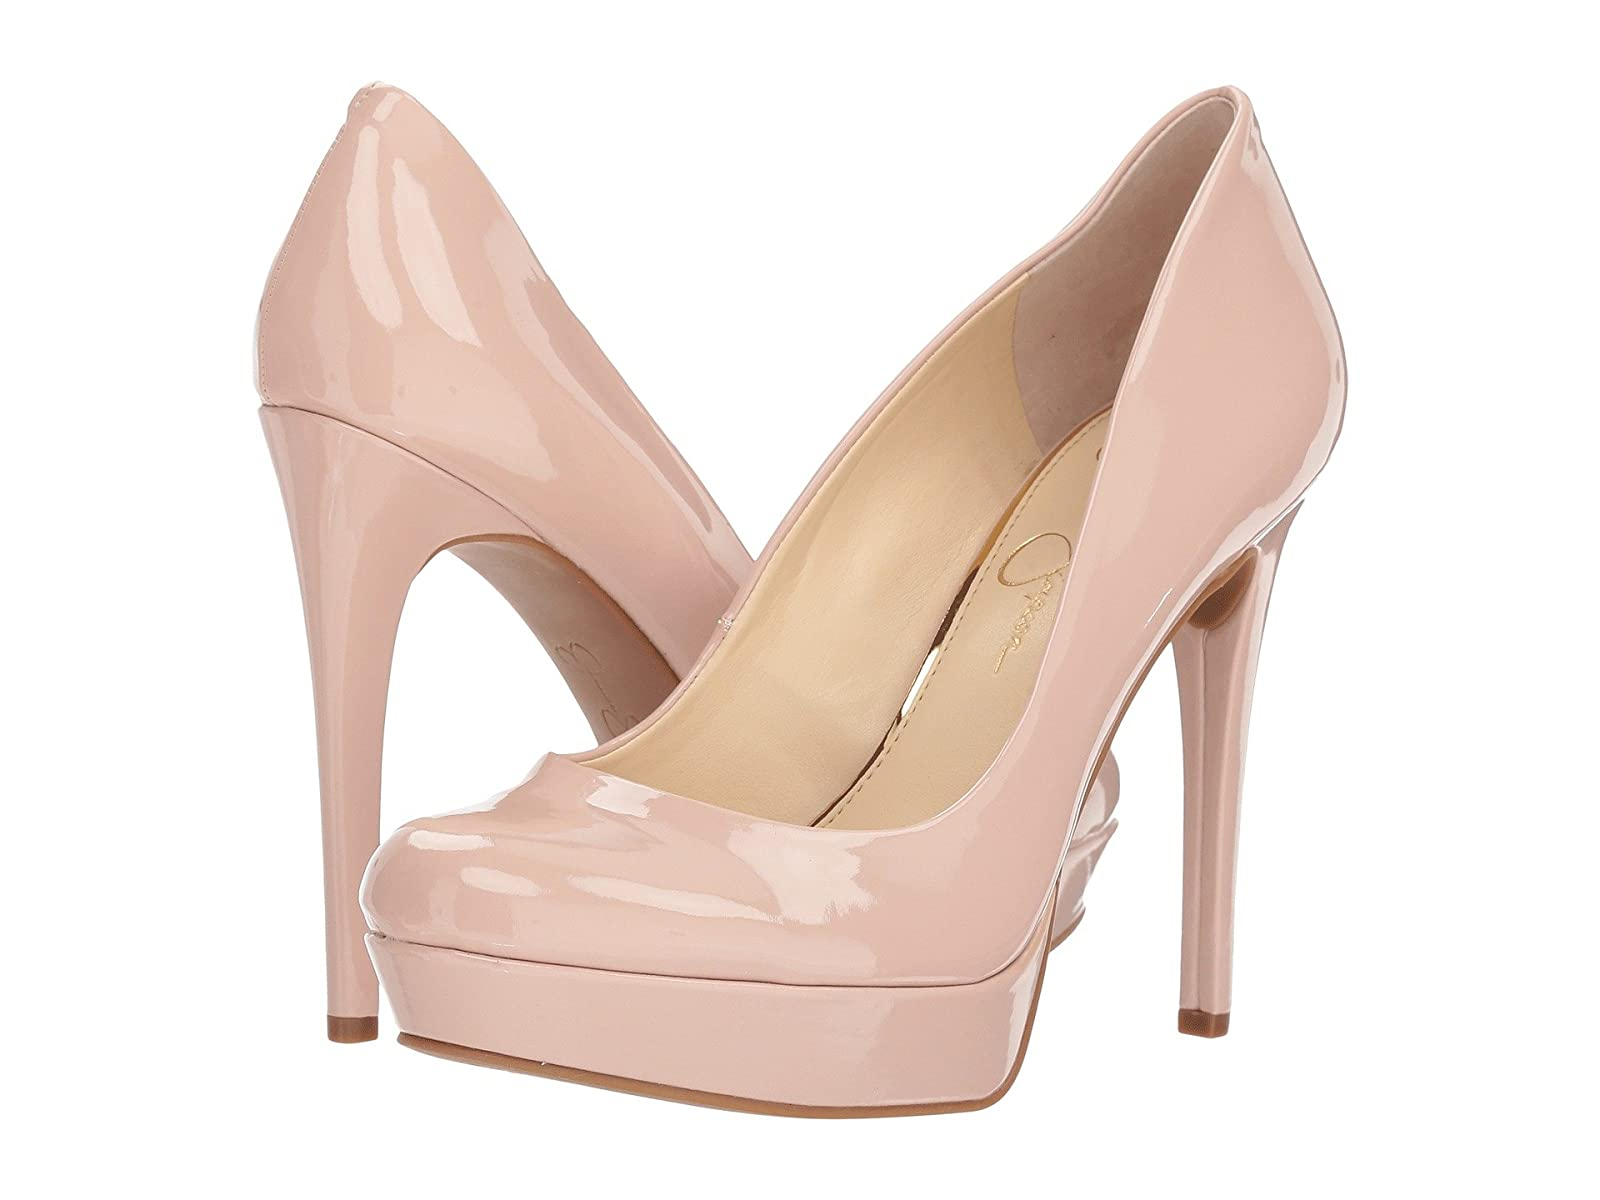 Jessica Simpson BaleendaCheap and distinctive eye-catching shoes